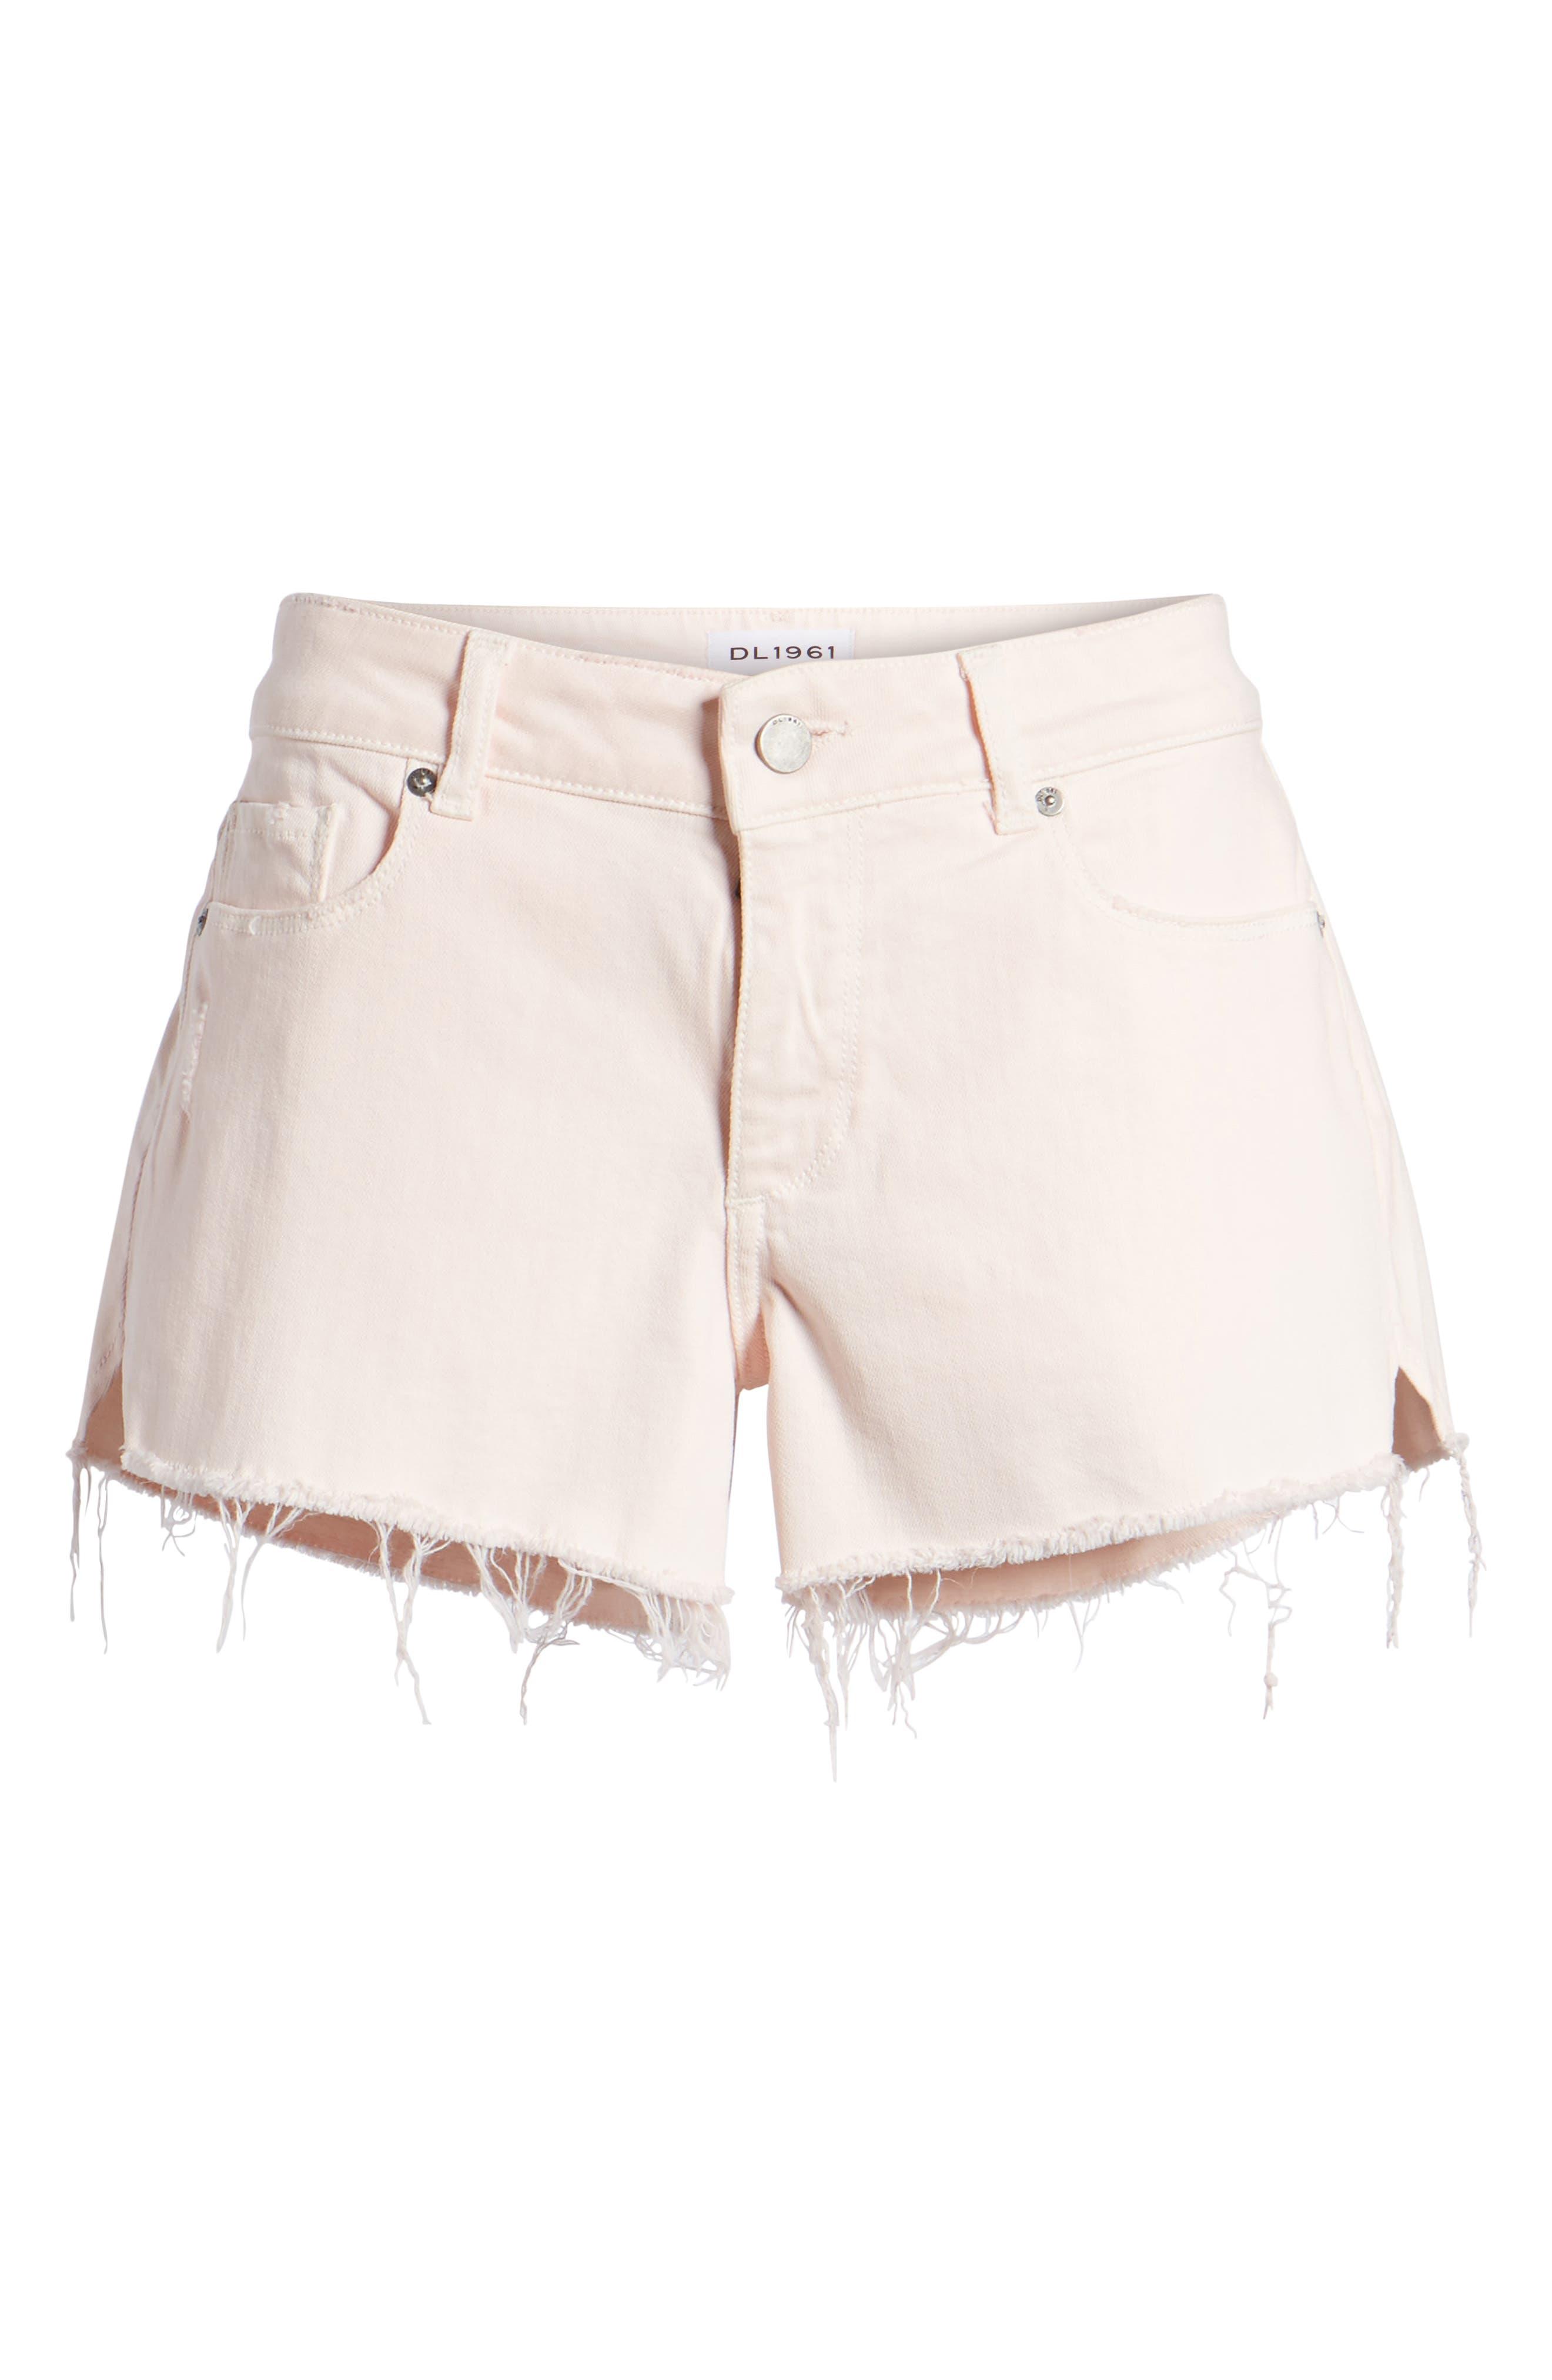 Renee Notch Raw Hem Denim Shorts,                             Alternate thumbnail 6, color,                             Blush Pink